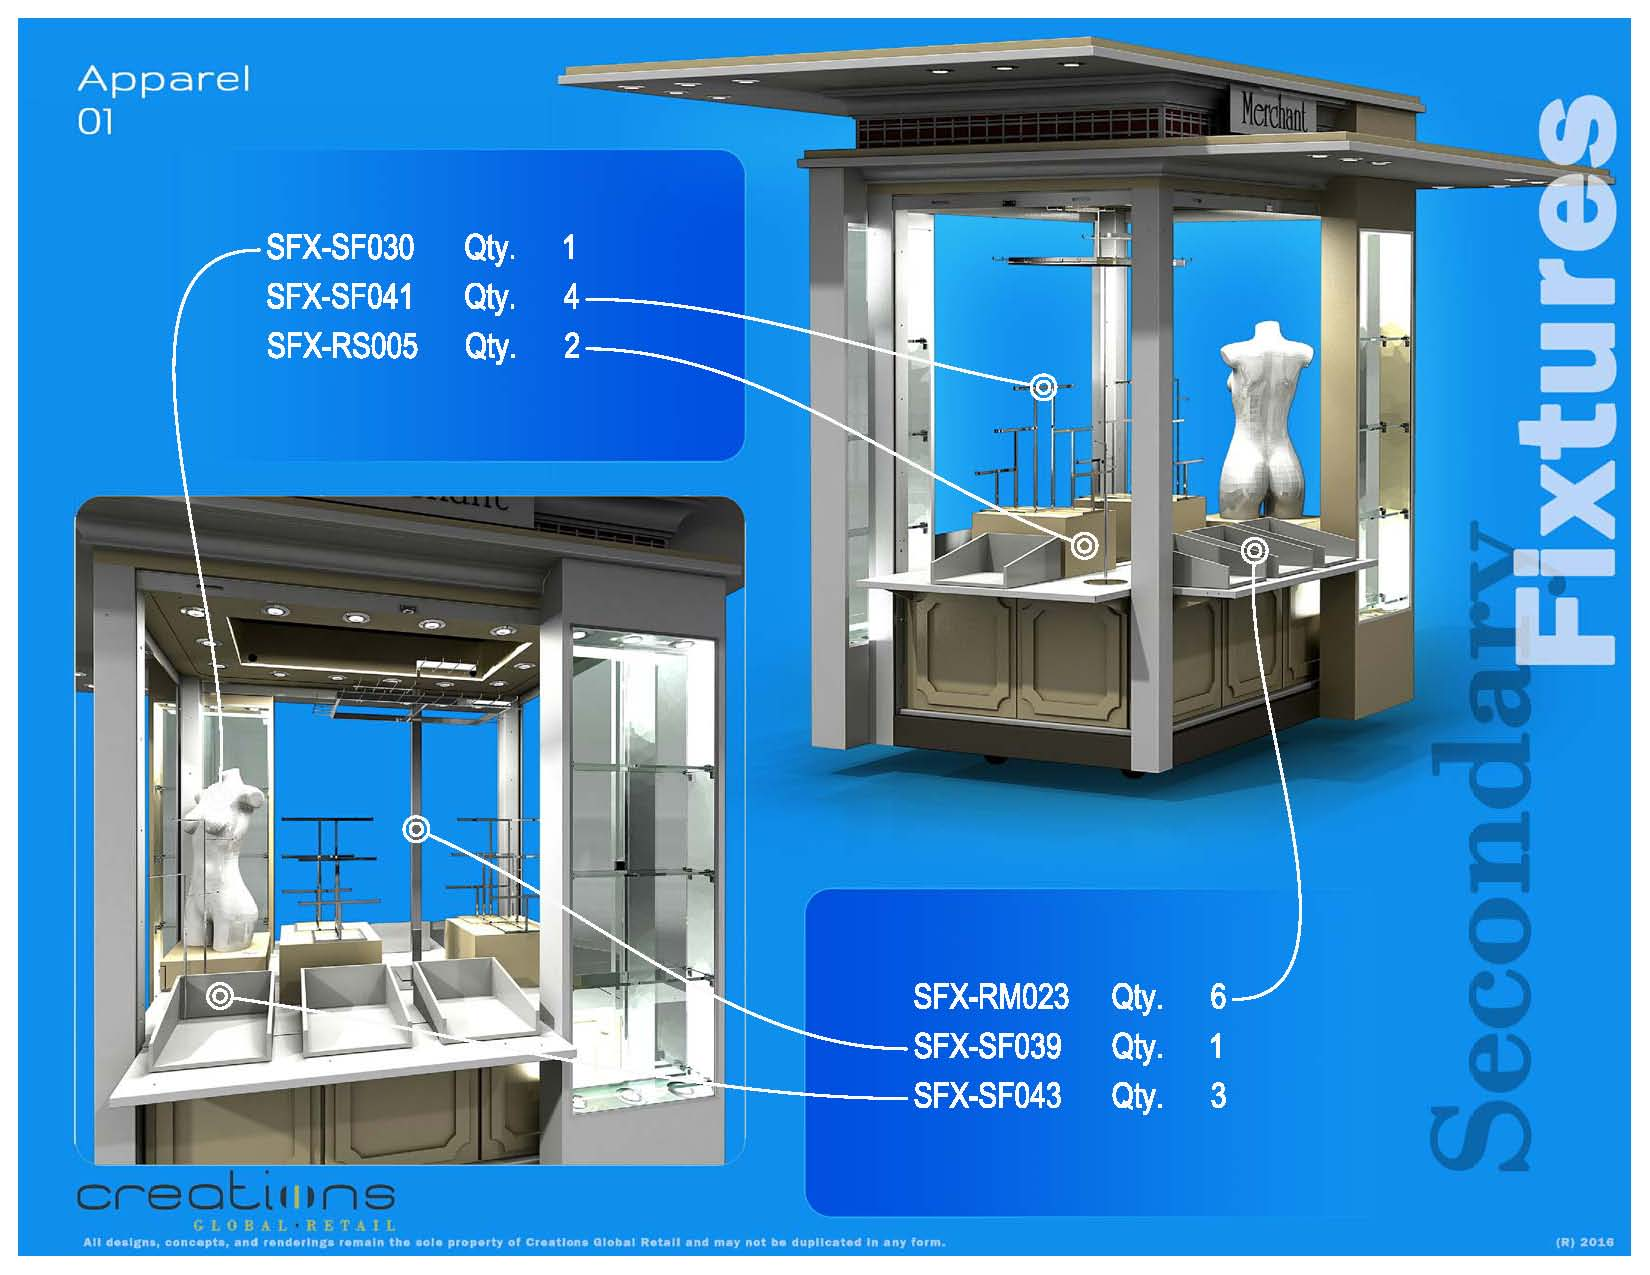 Visual Merchandising planning guide - Simon Mod-Prairie_Page_01